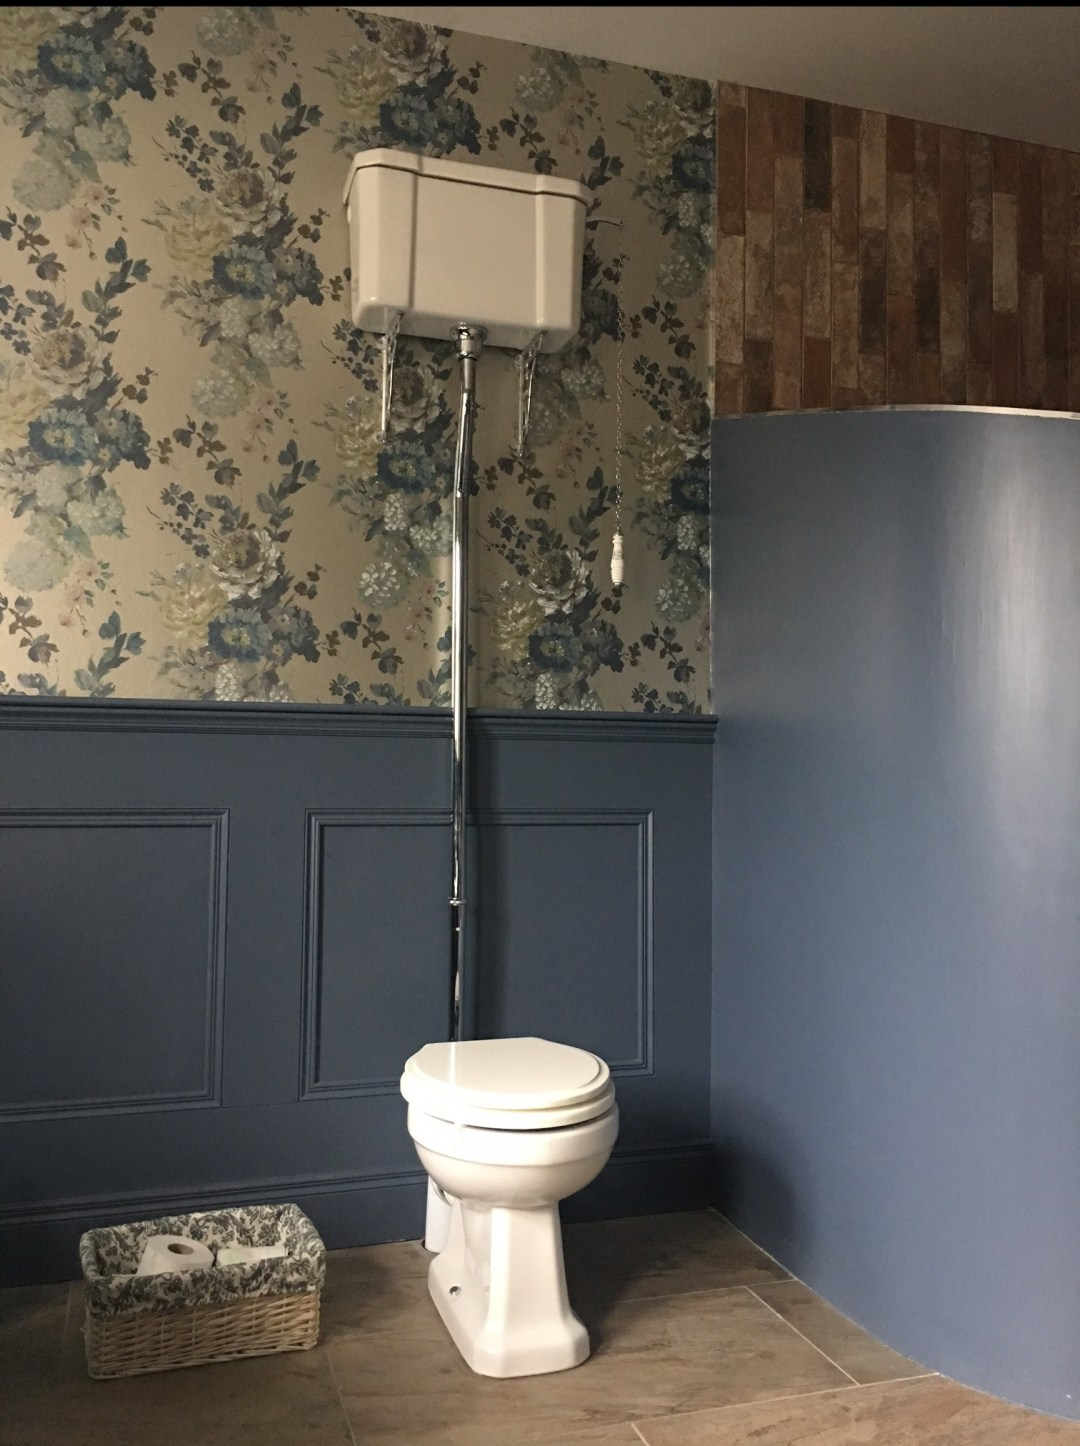 victoria-high-level-cistern-toilet.jpg